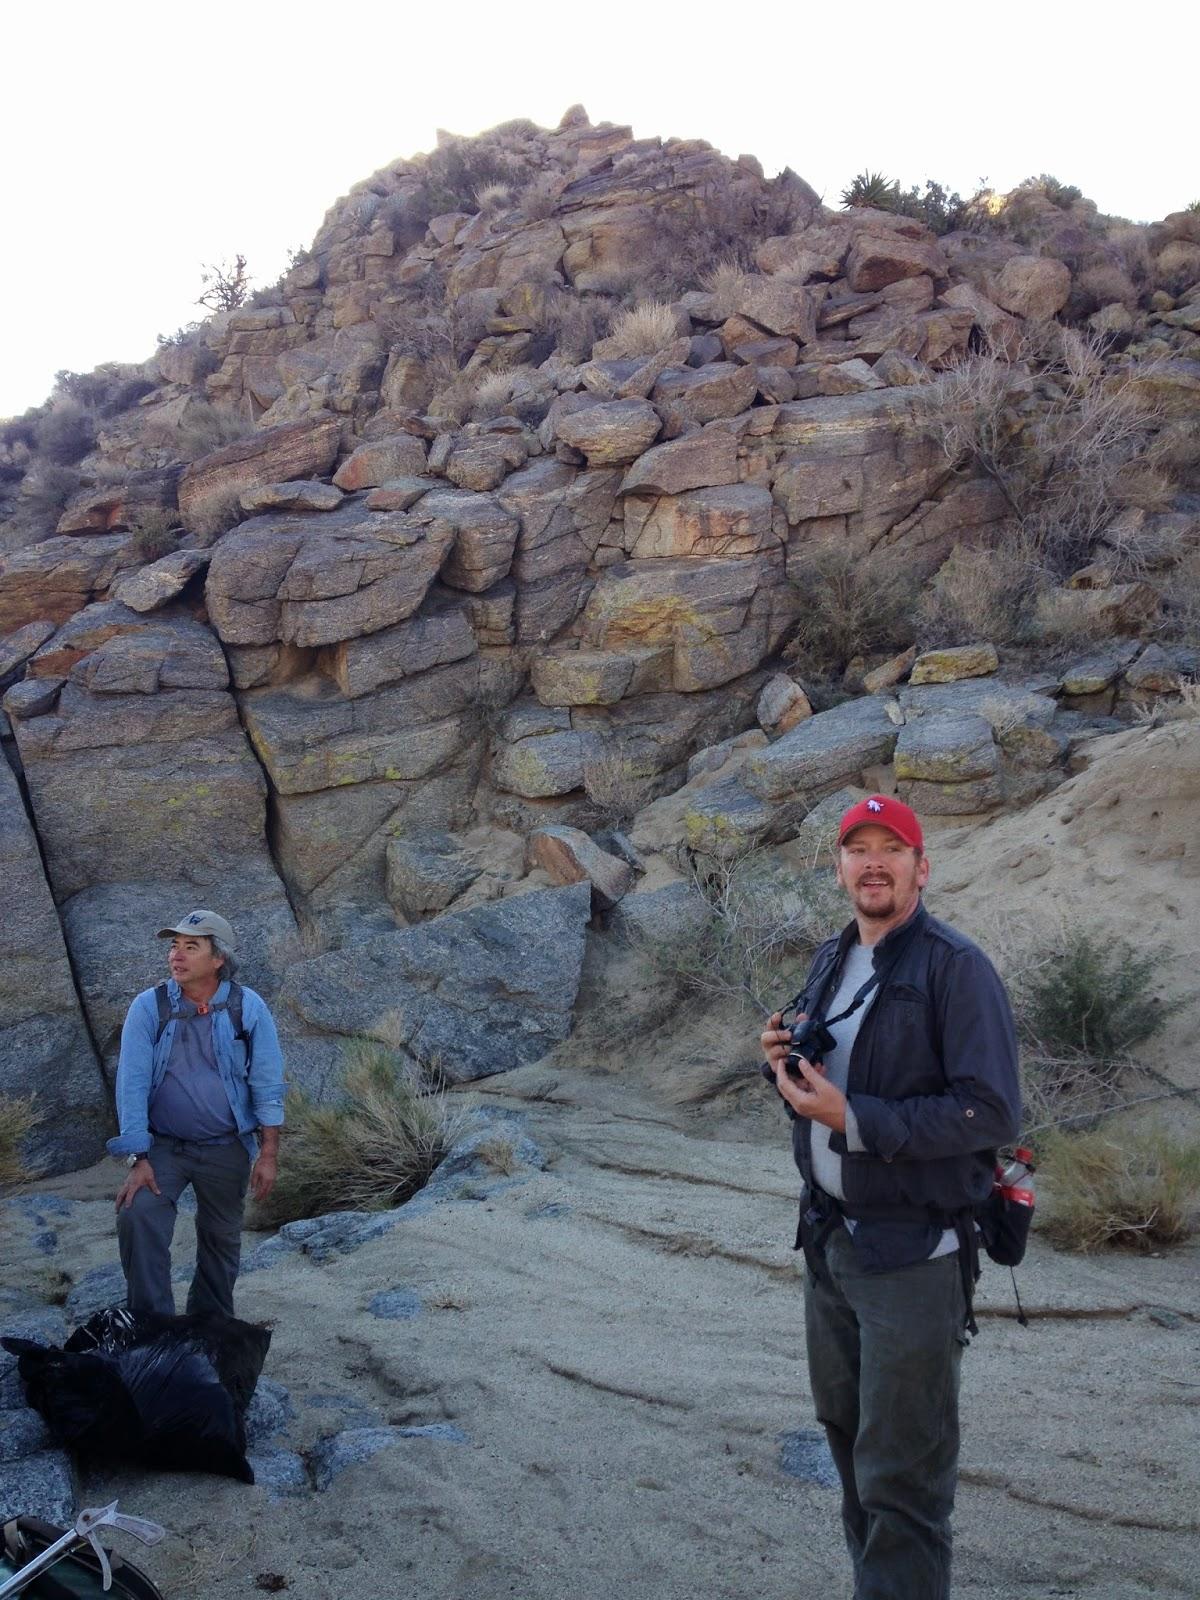 A Slender Margin for Survival (Part II) – Living Alongside Wildlife